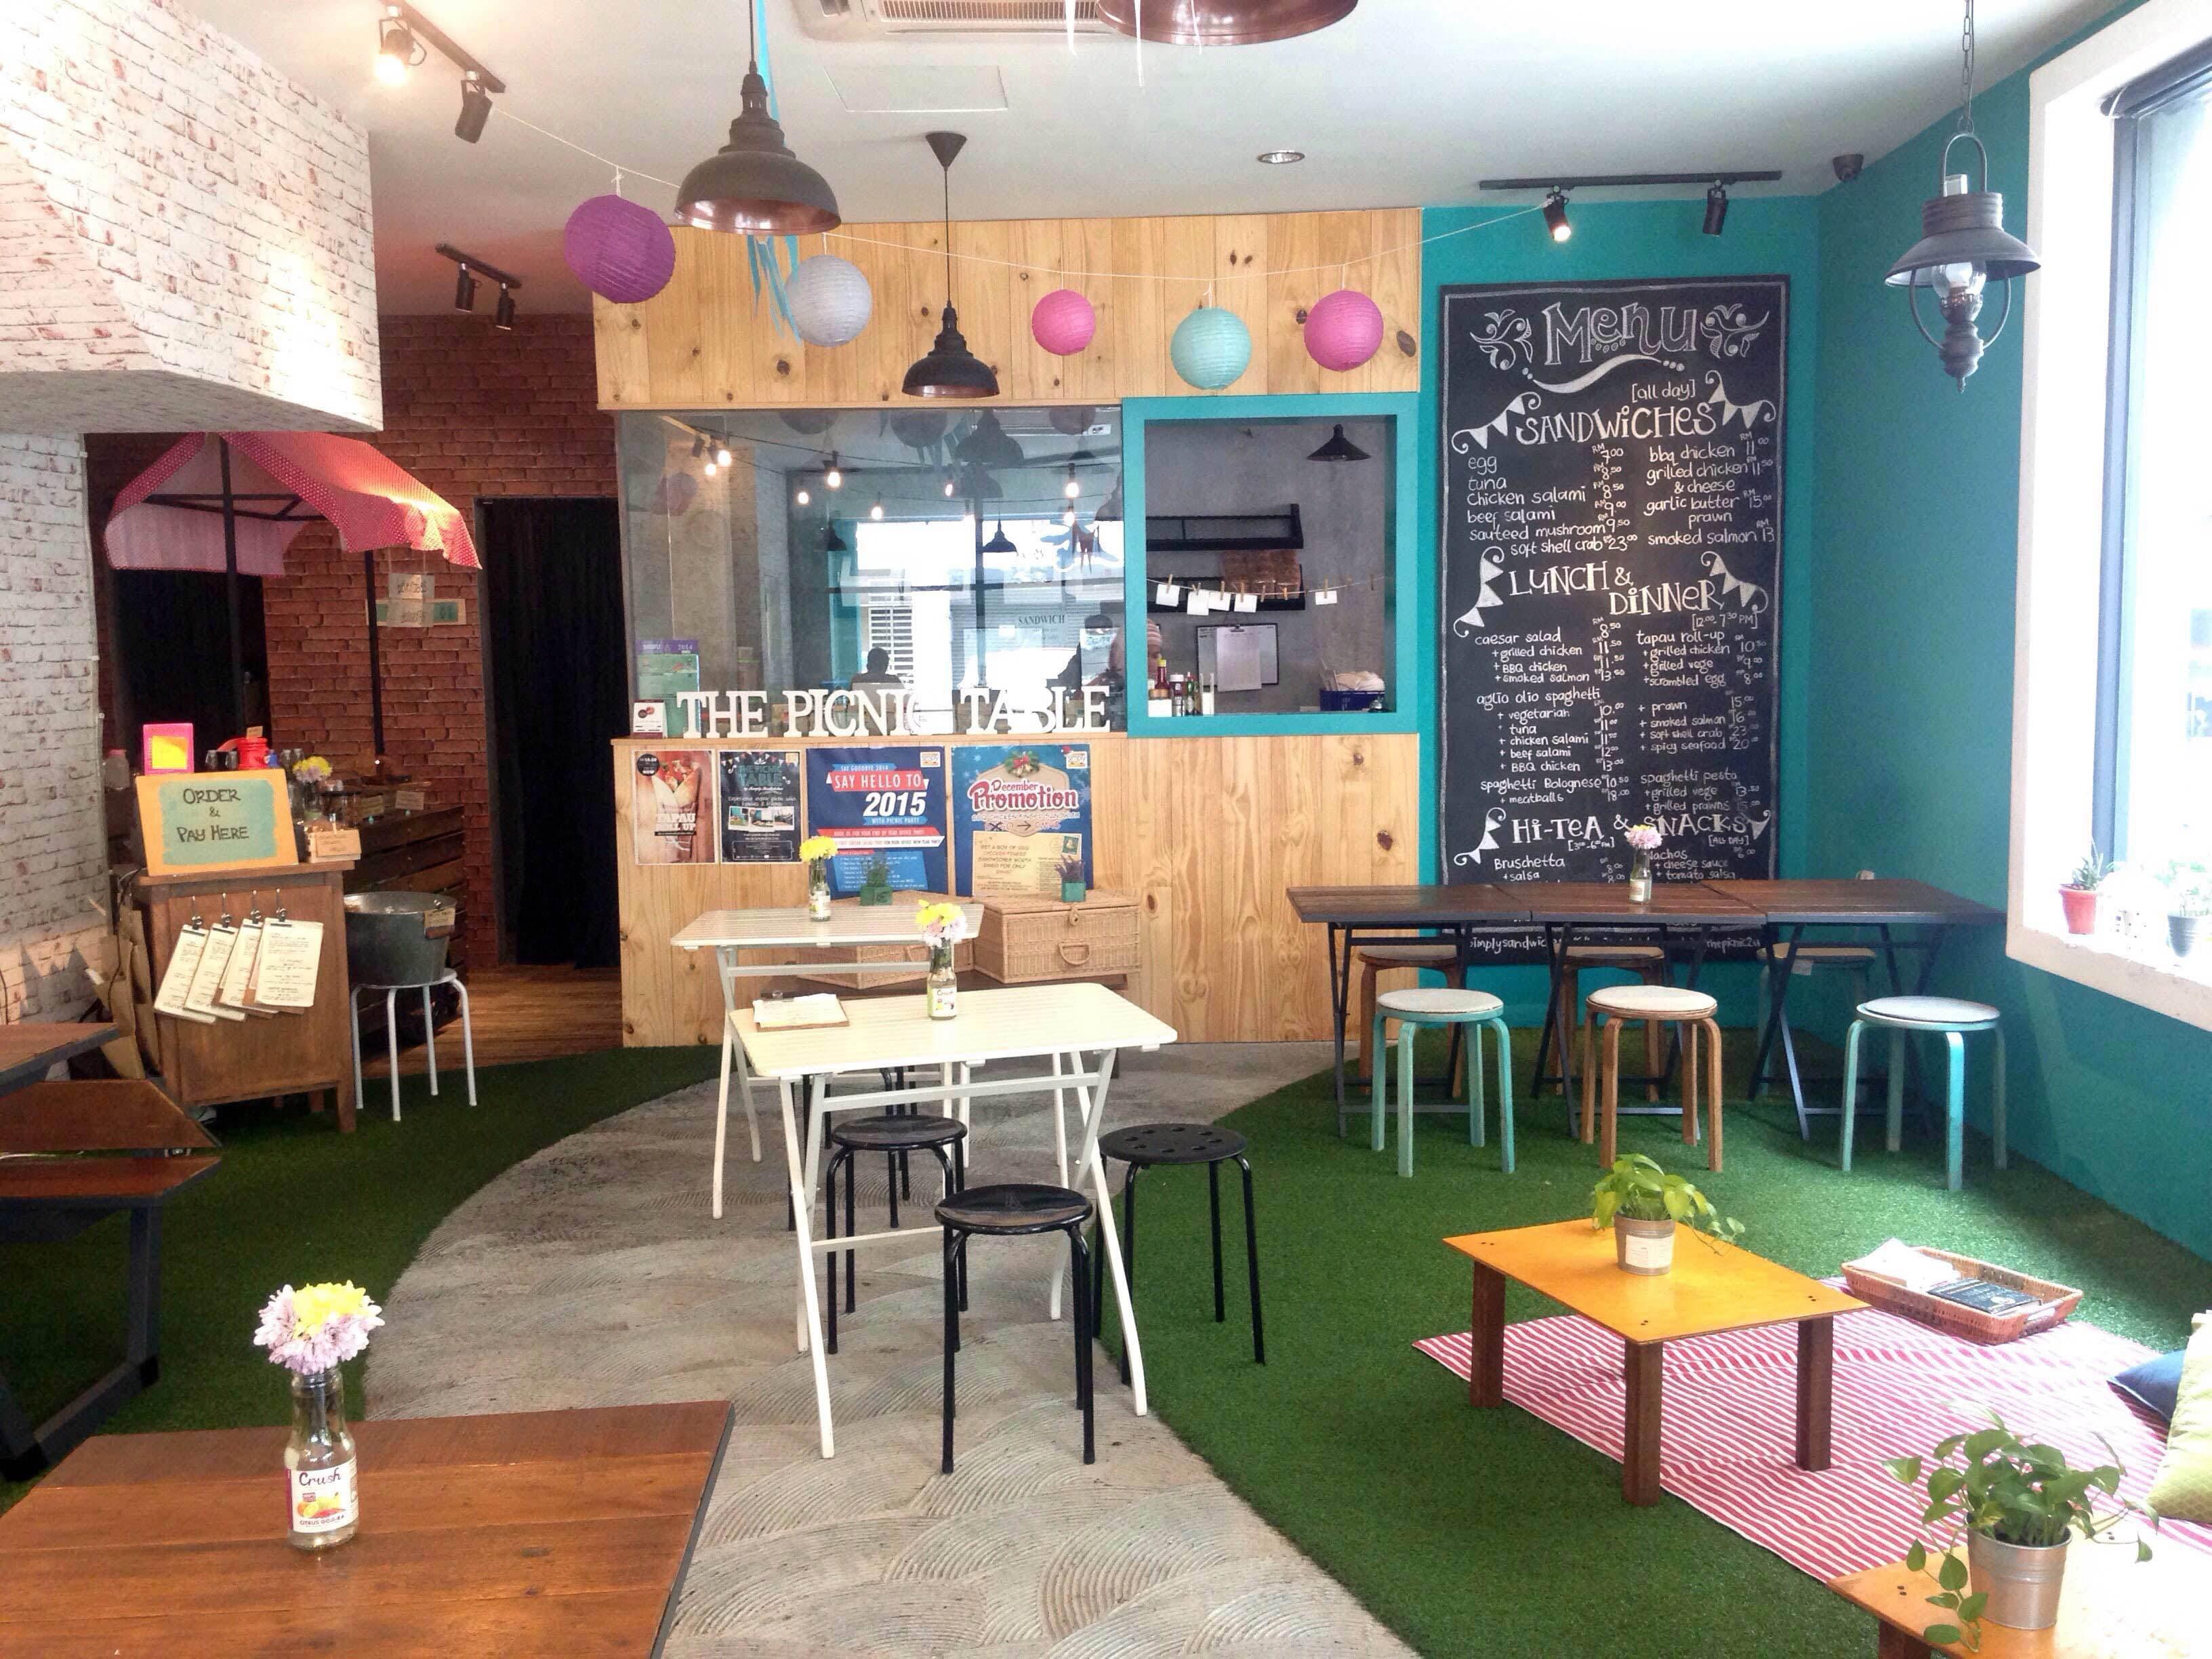 Fancy a picnic in a cafe?